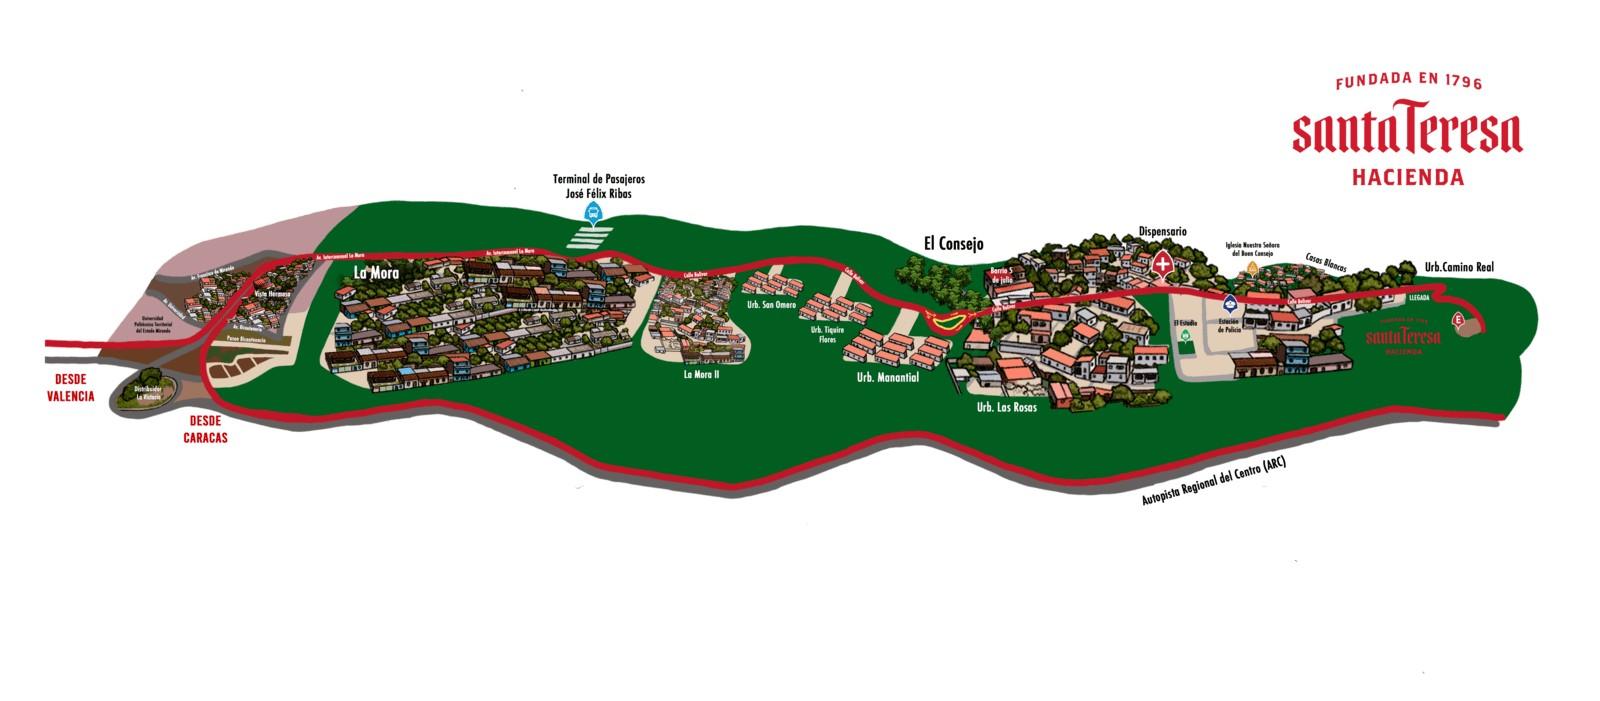 Mapa Hacienda Santa Teresa - Como llegar